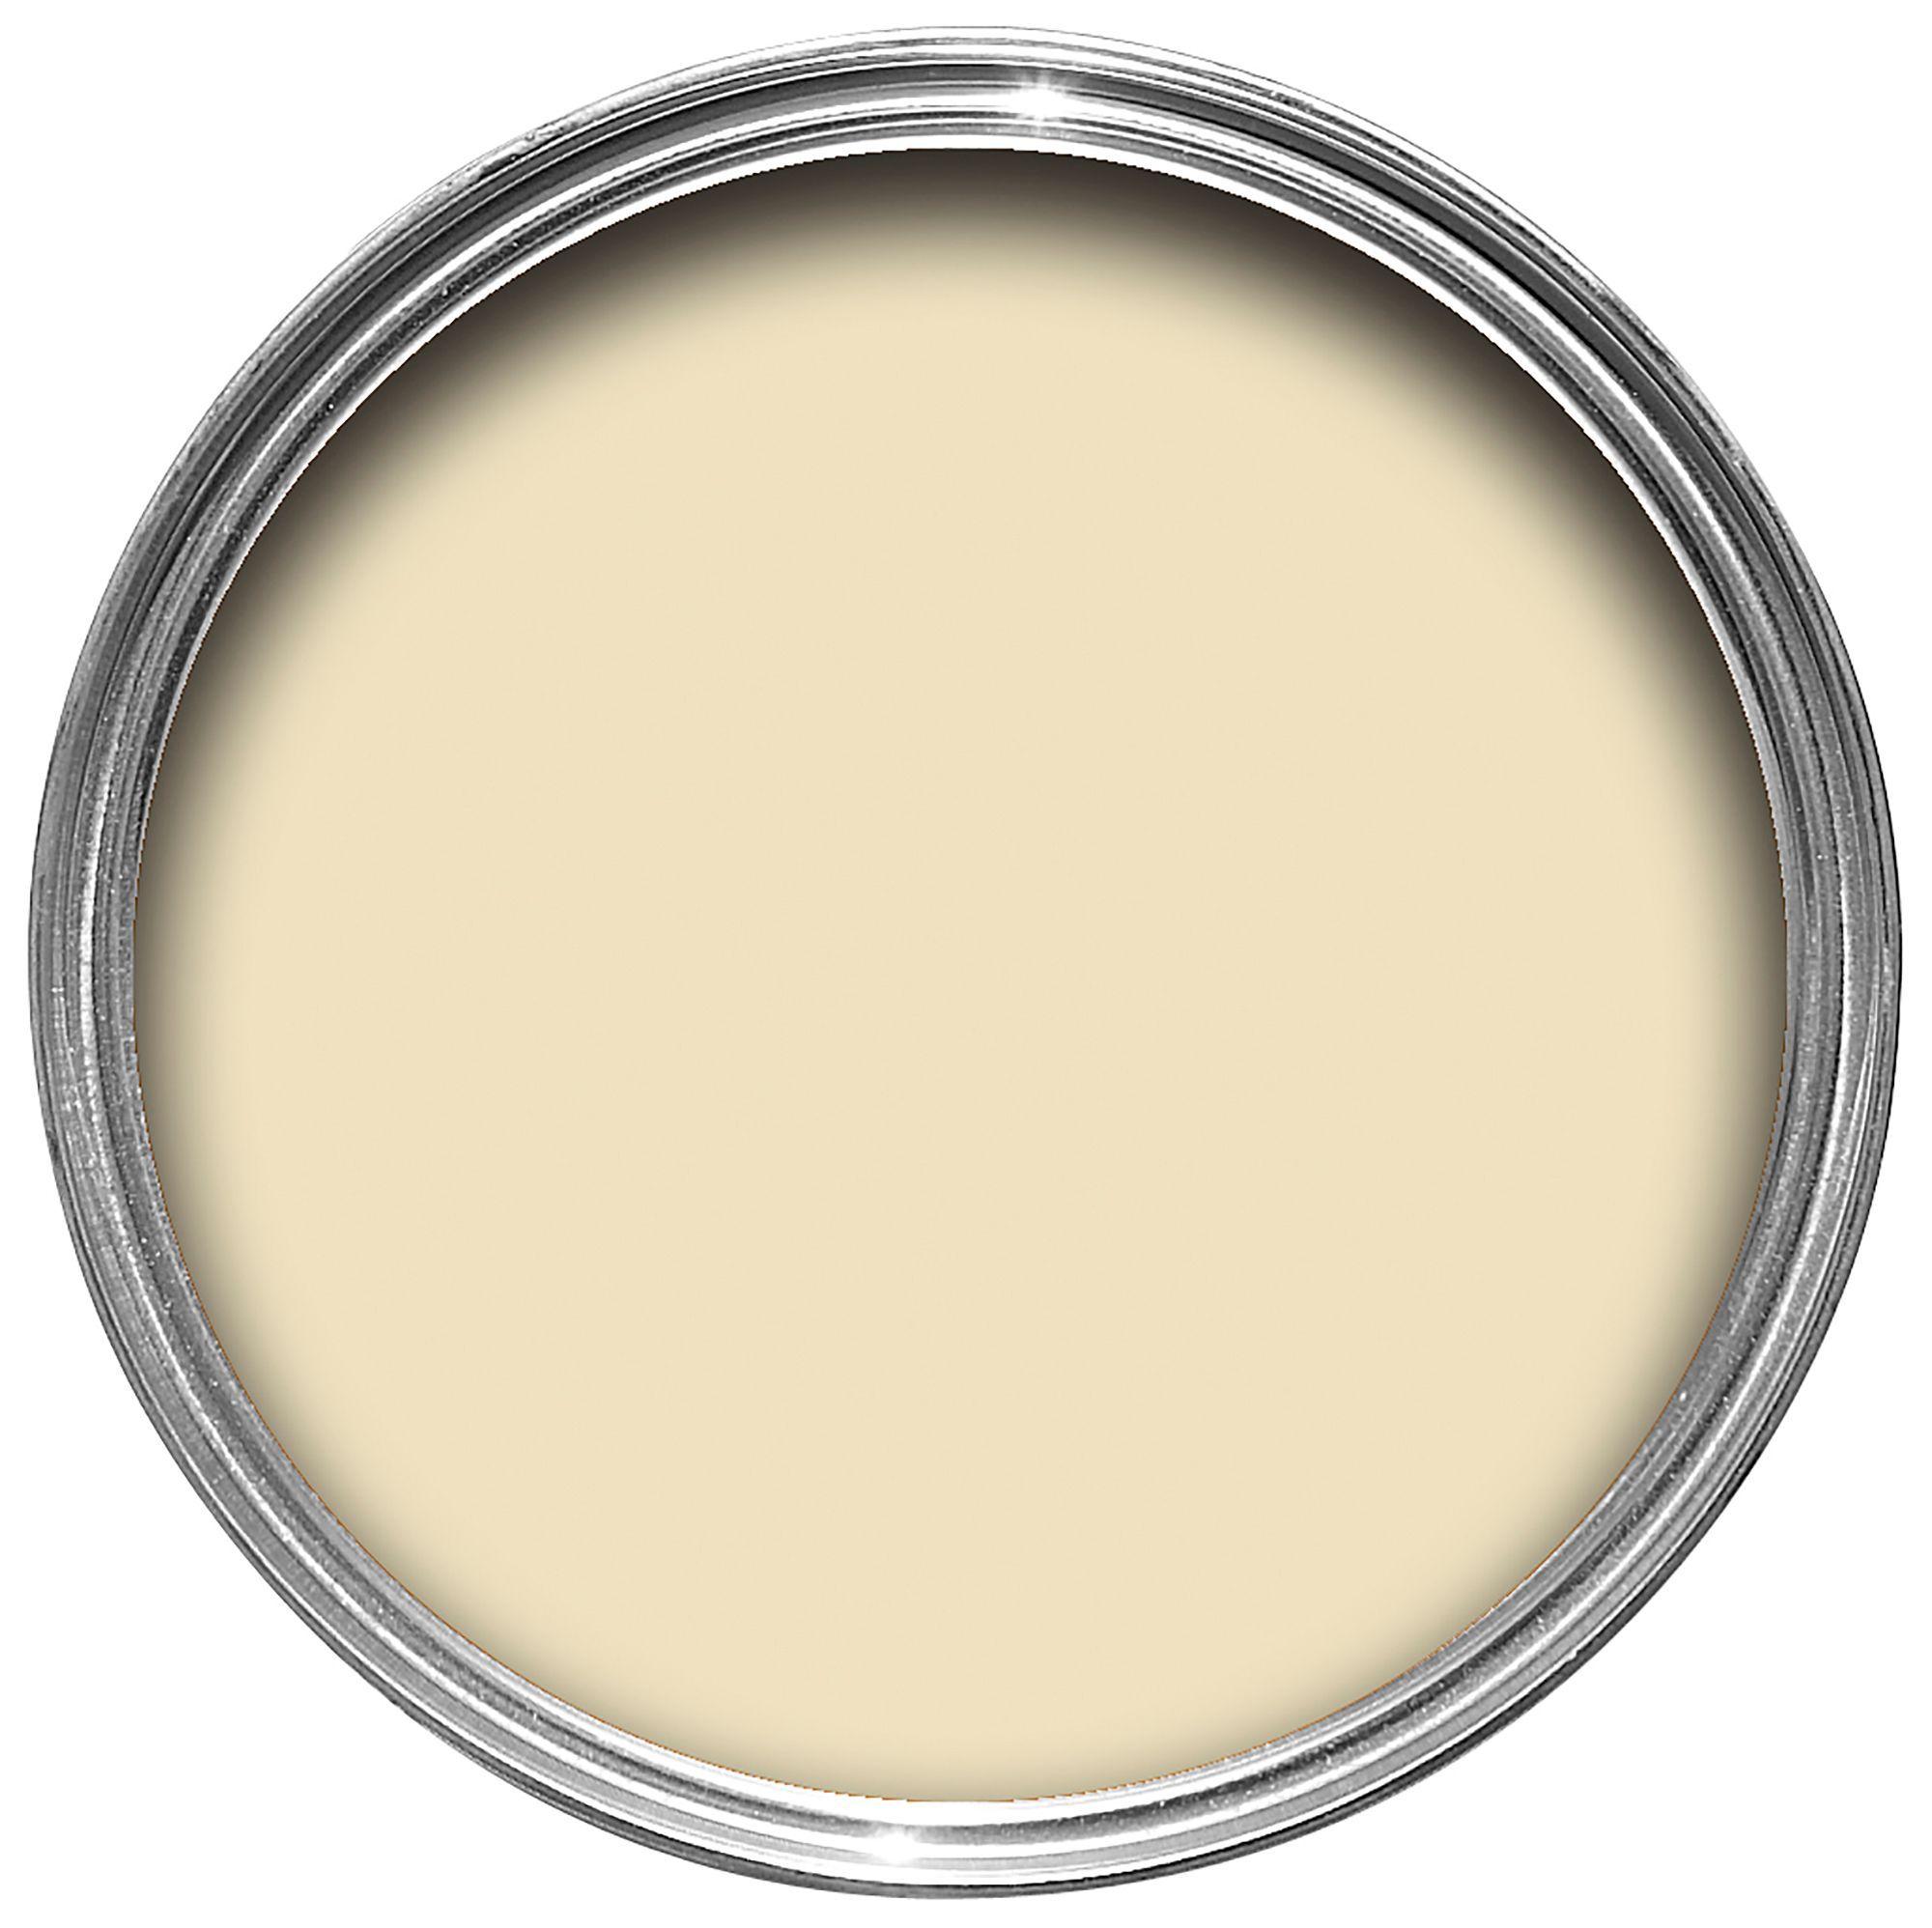 Sandtex Cornish Cream Textured Masonry Paint 10l Departments Diy At B Q